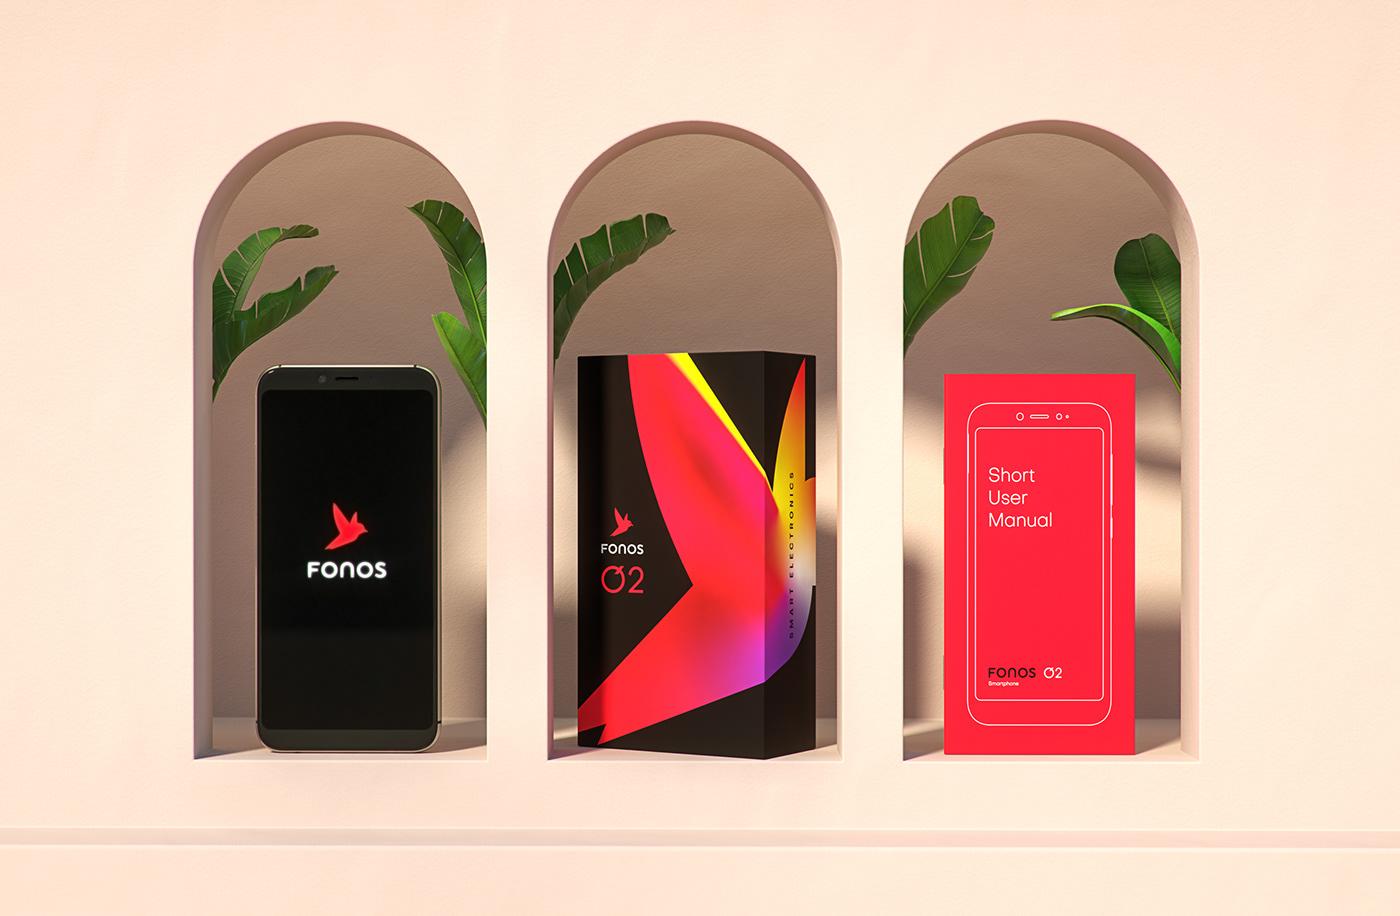 branding  godspeed godspeedbranding identity Packaging smartphone tech technologies